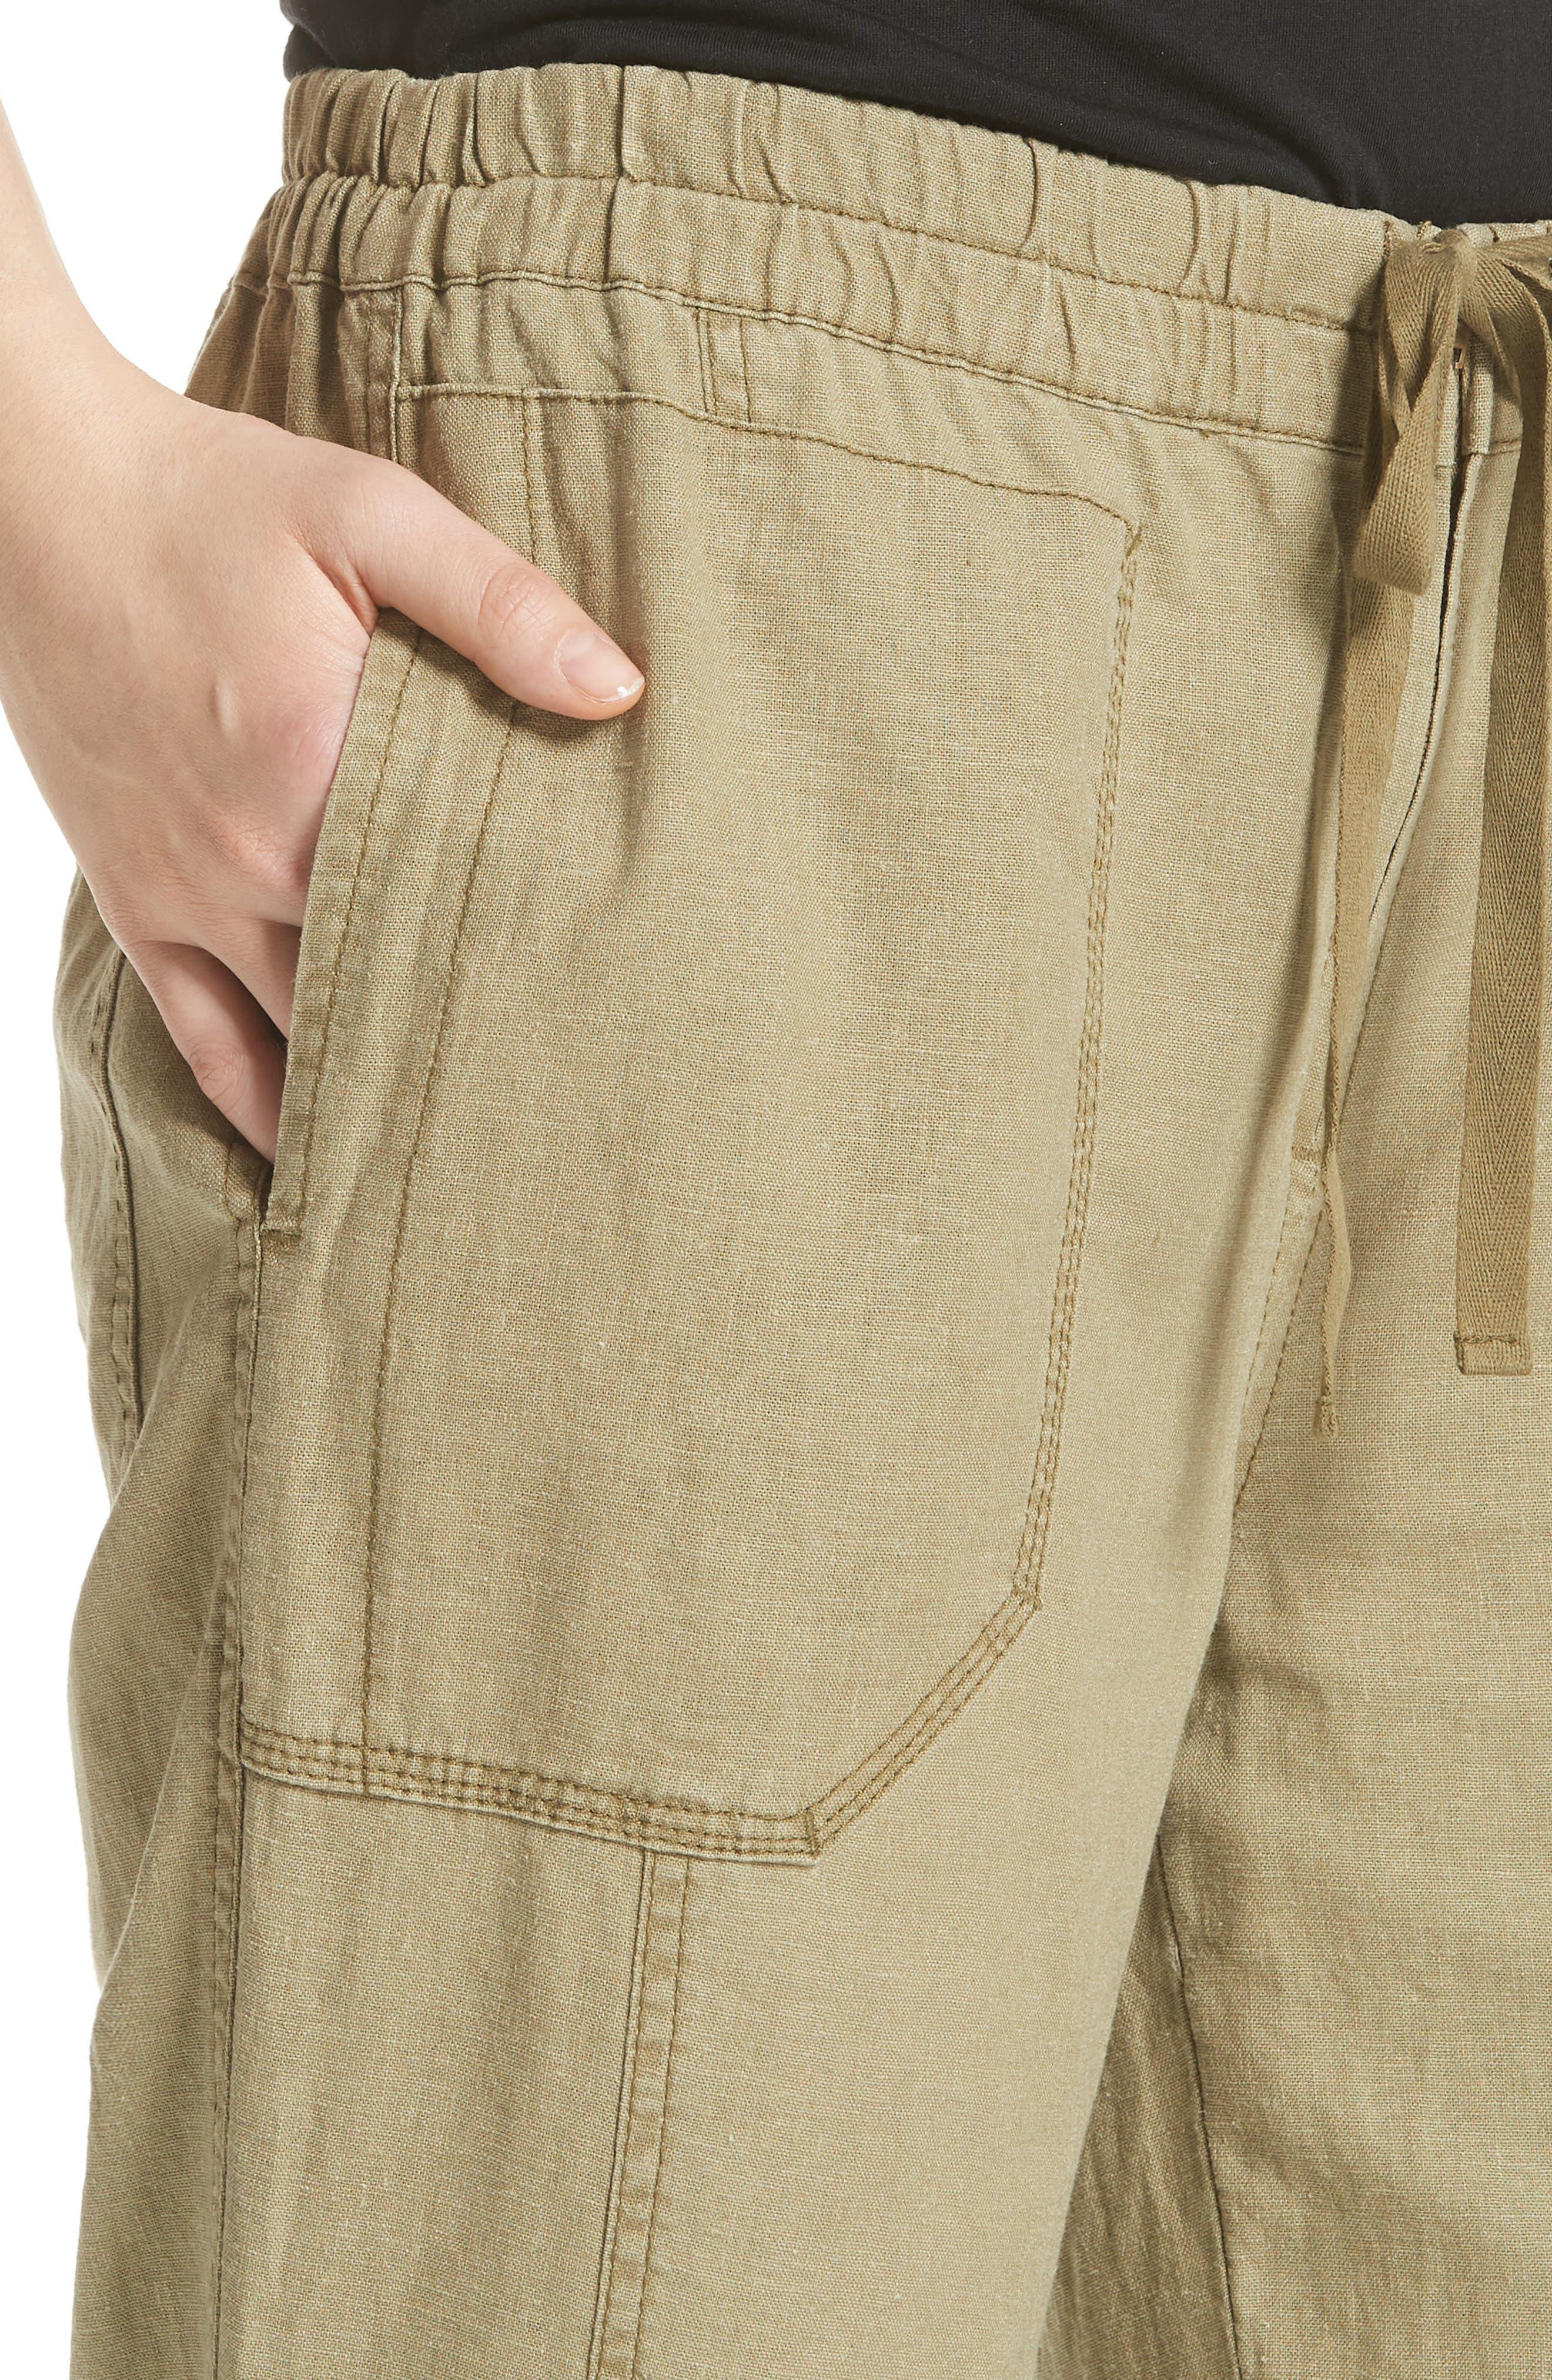 Palmer Skinny Utility Pants,                             Alternate thumbnail 7, color,